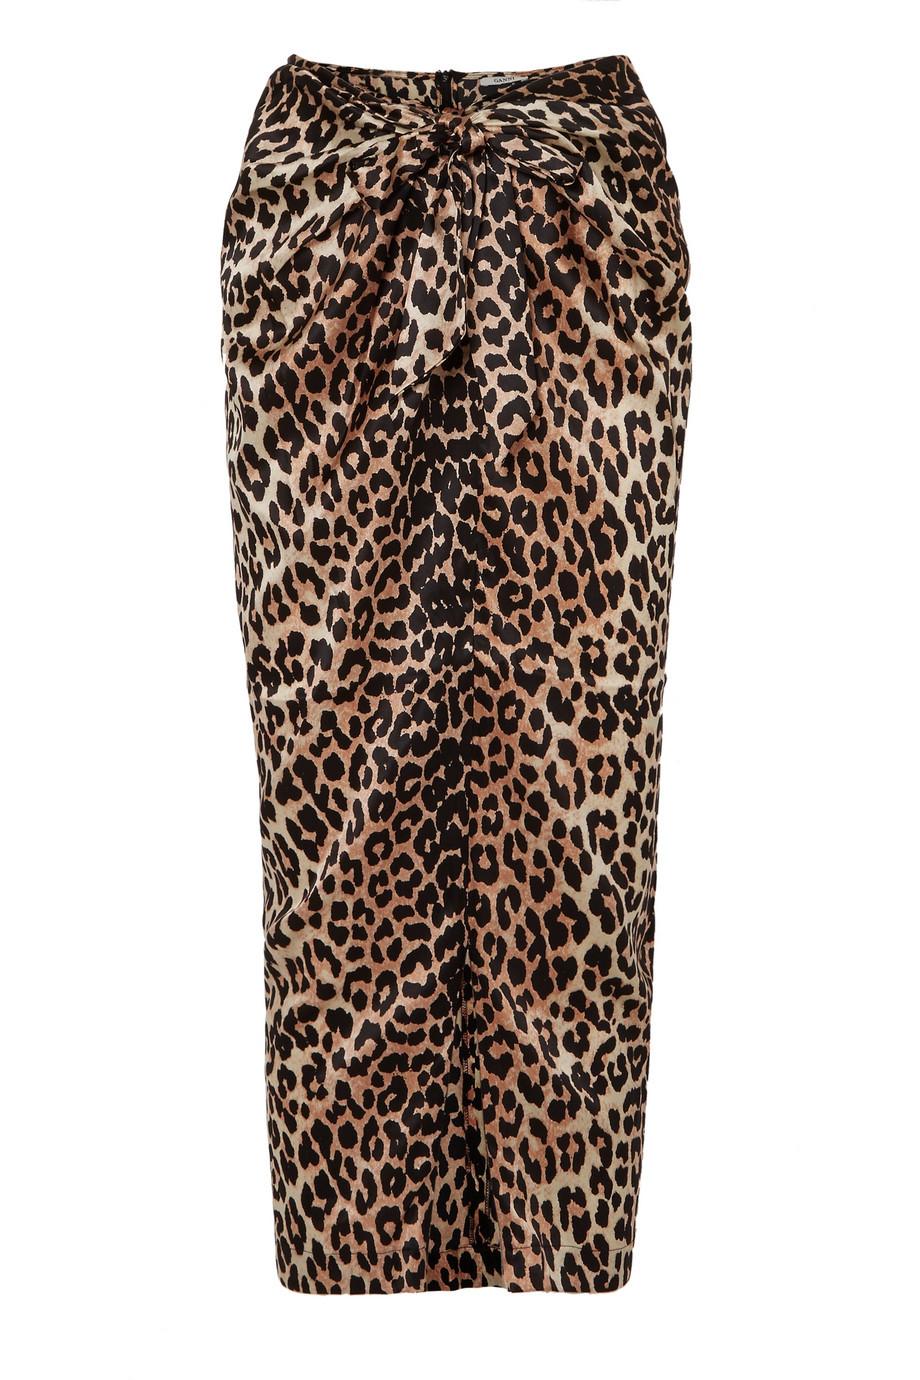 Falda de leopardo de Ganni (240 euros).